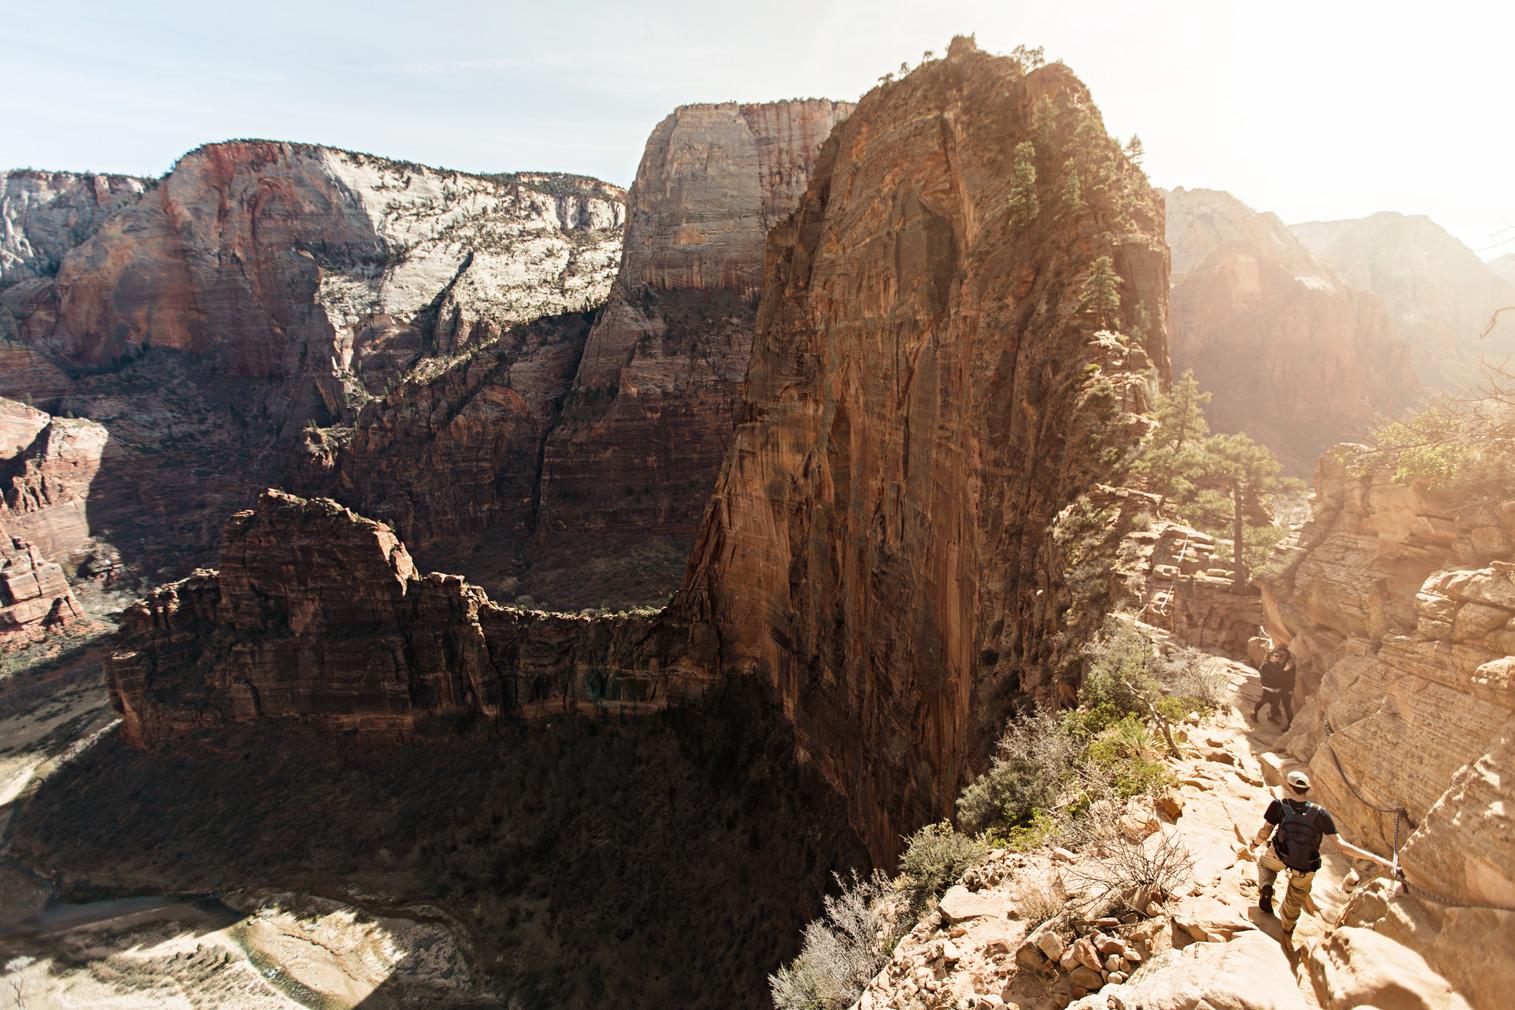 CindyGiovagnoli_Utah_Zion_National_Park_Angels_Landing_hike-006.jpg